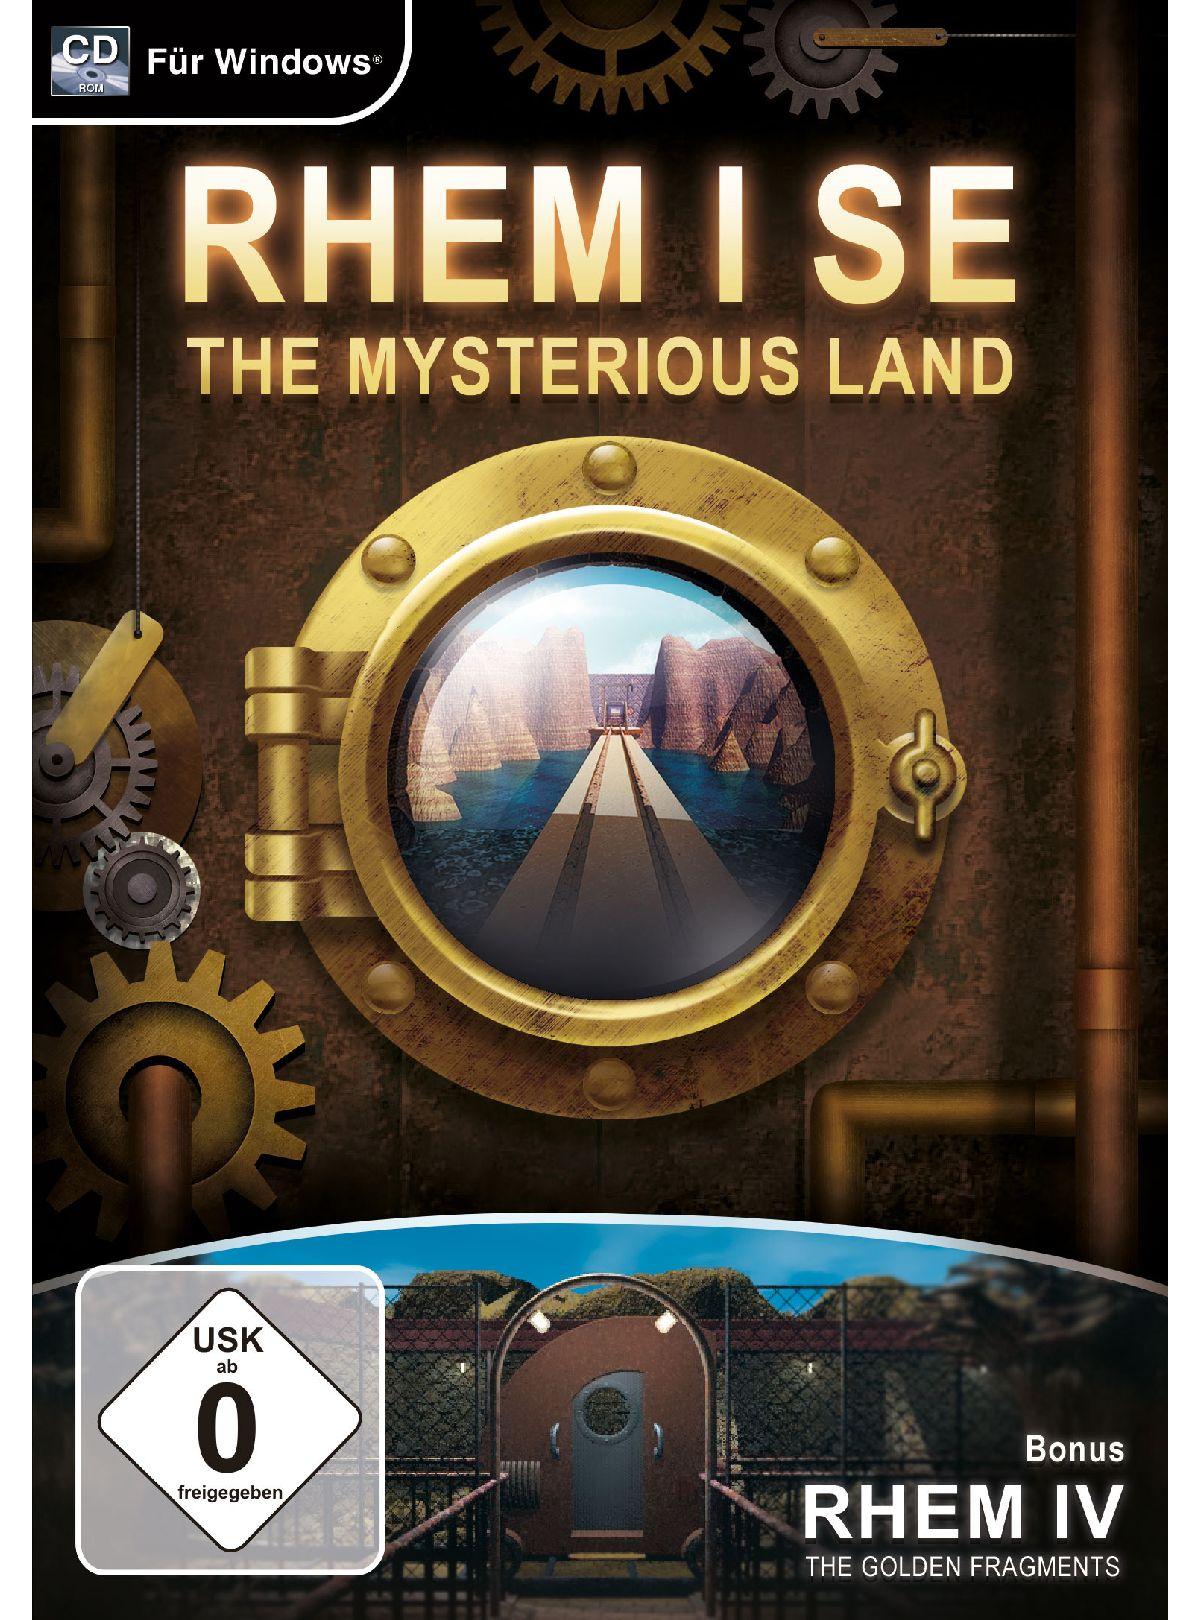 Koch Media RHEM I SE - The Mysterious Land »PC«